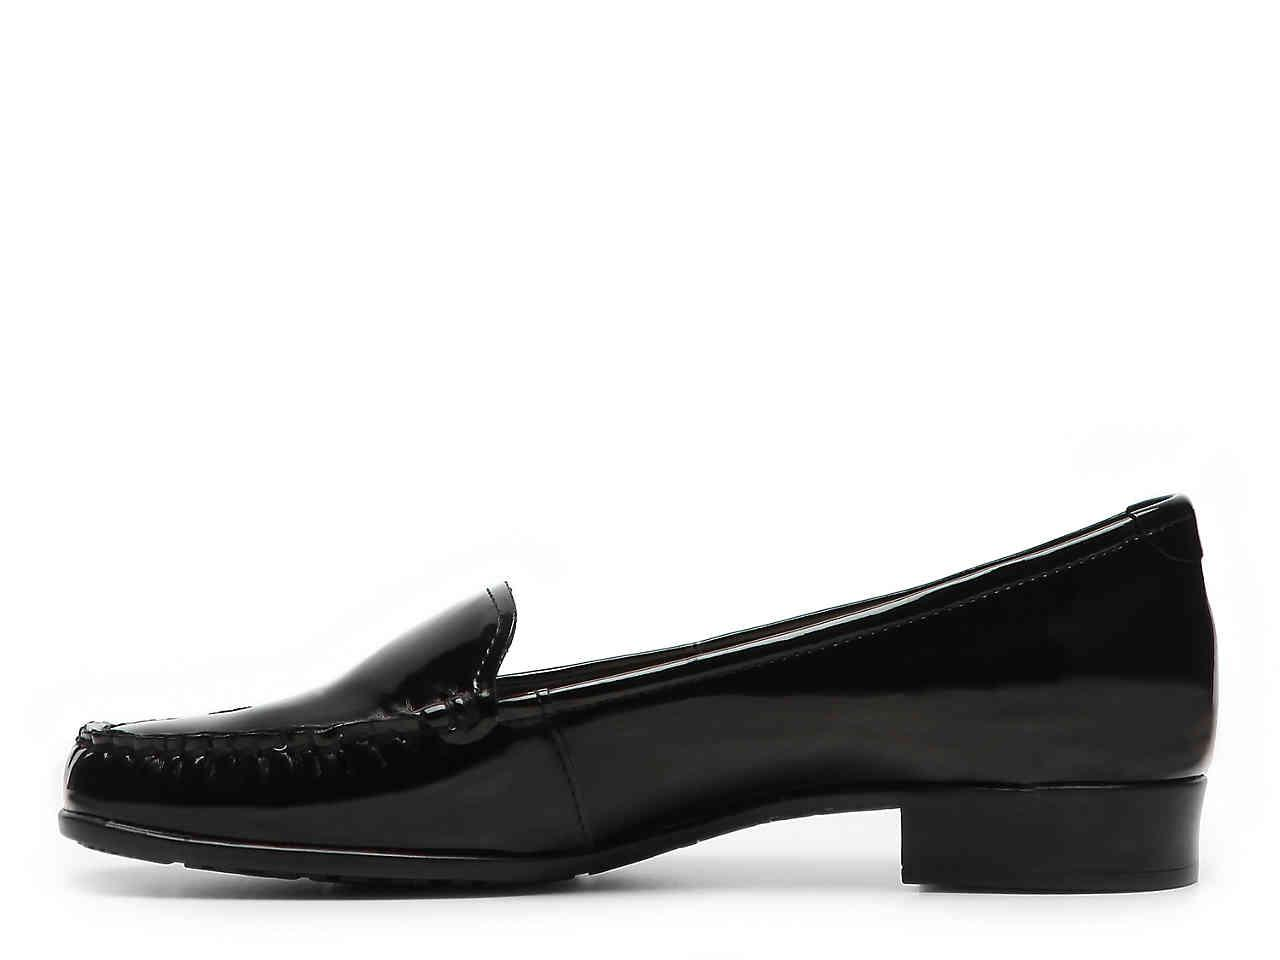 e6daf892e7ba Lyst - Anne Klein Vama Patent Loafer in Black